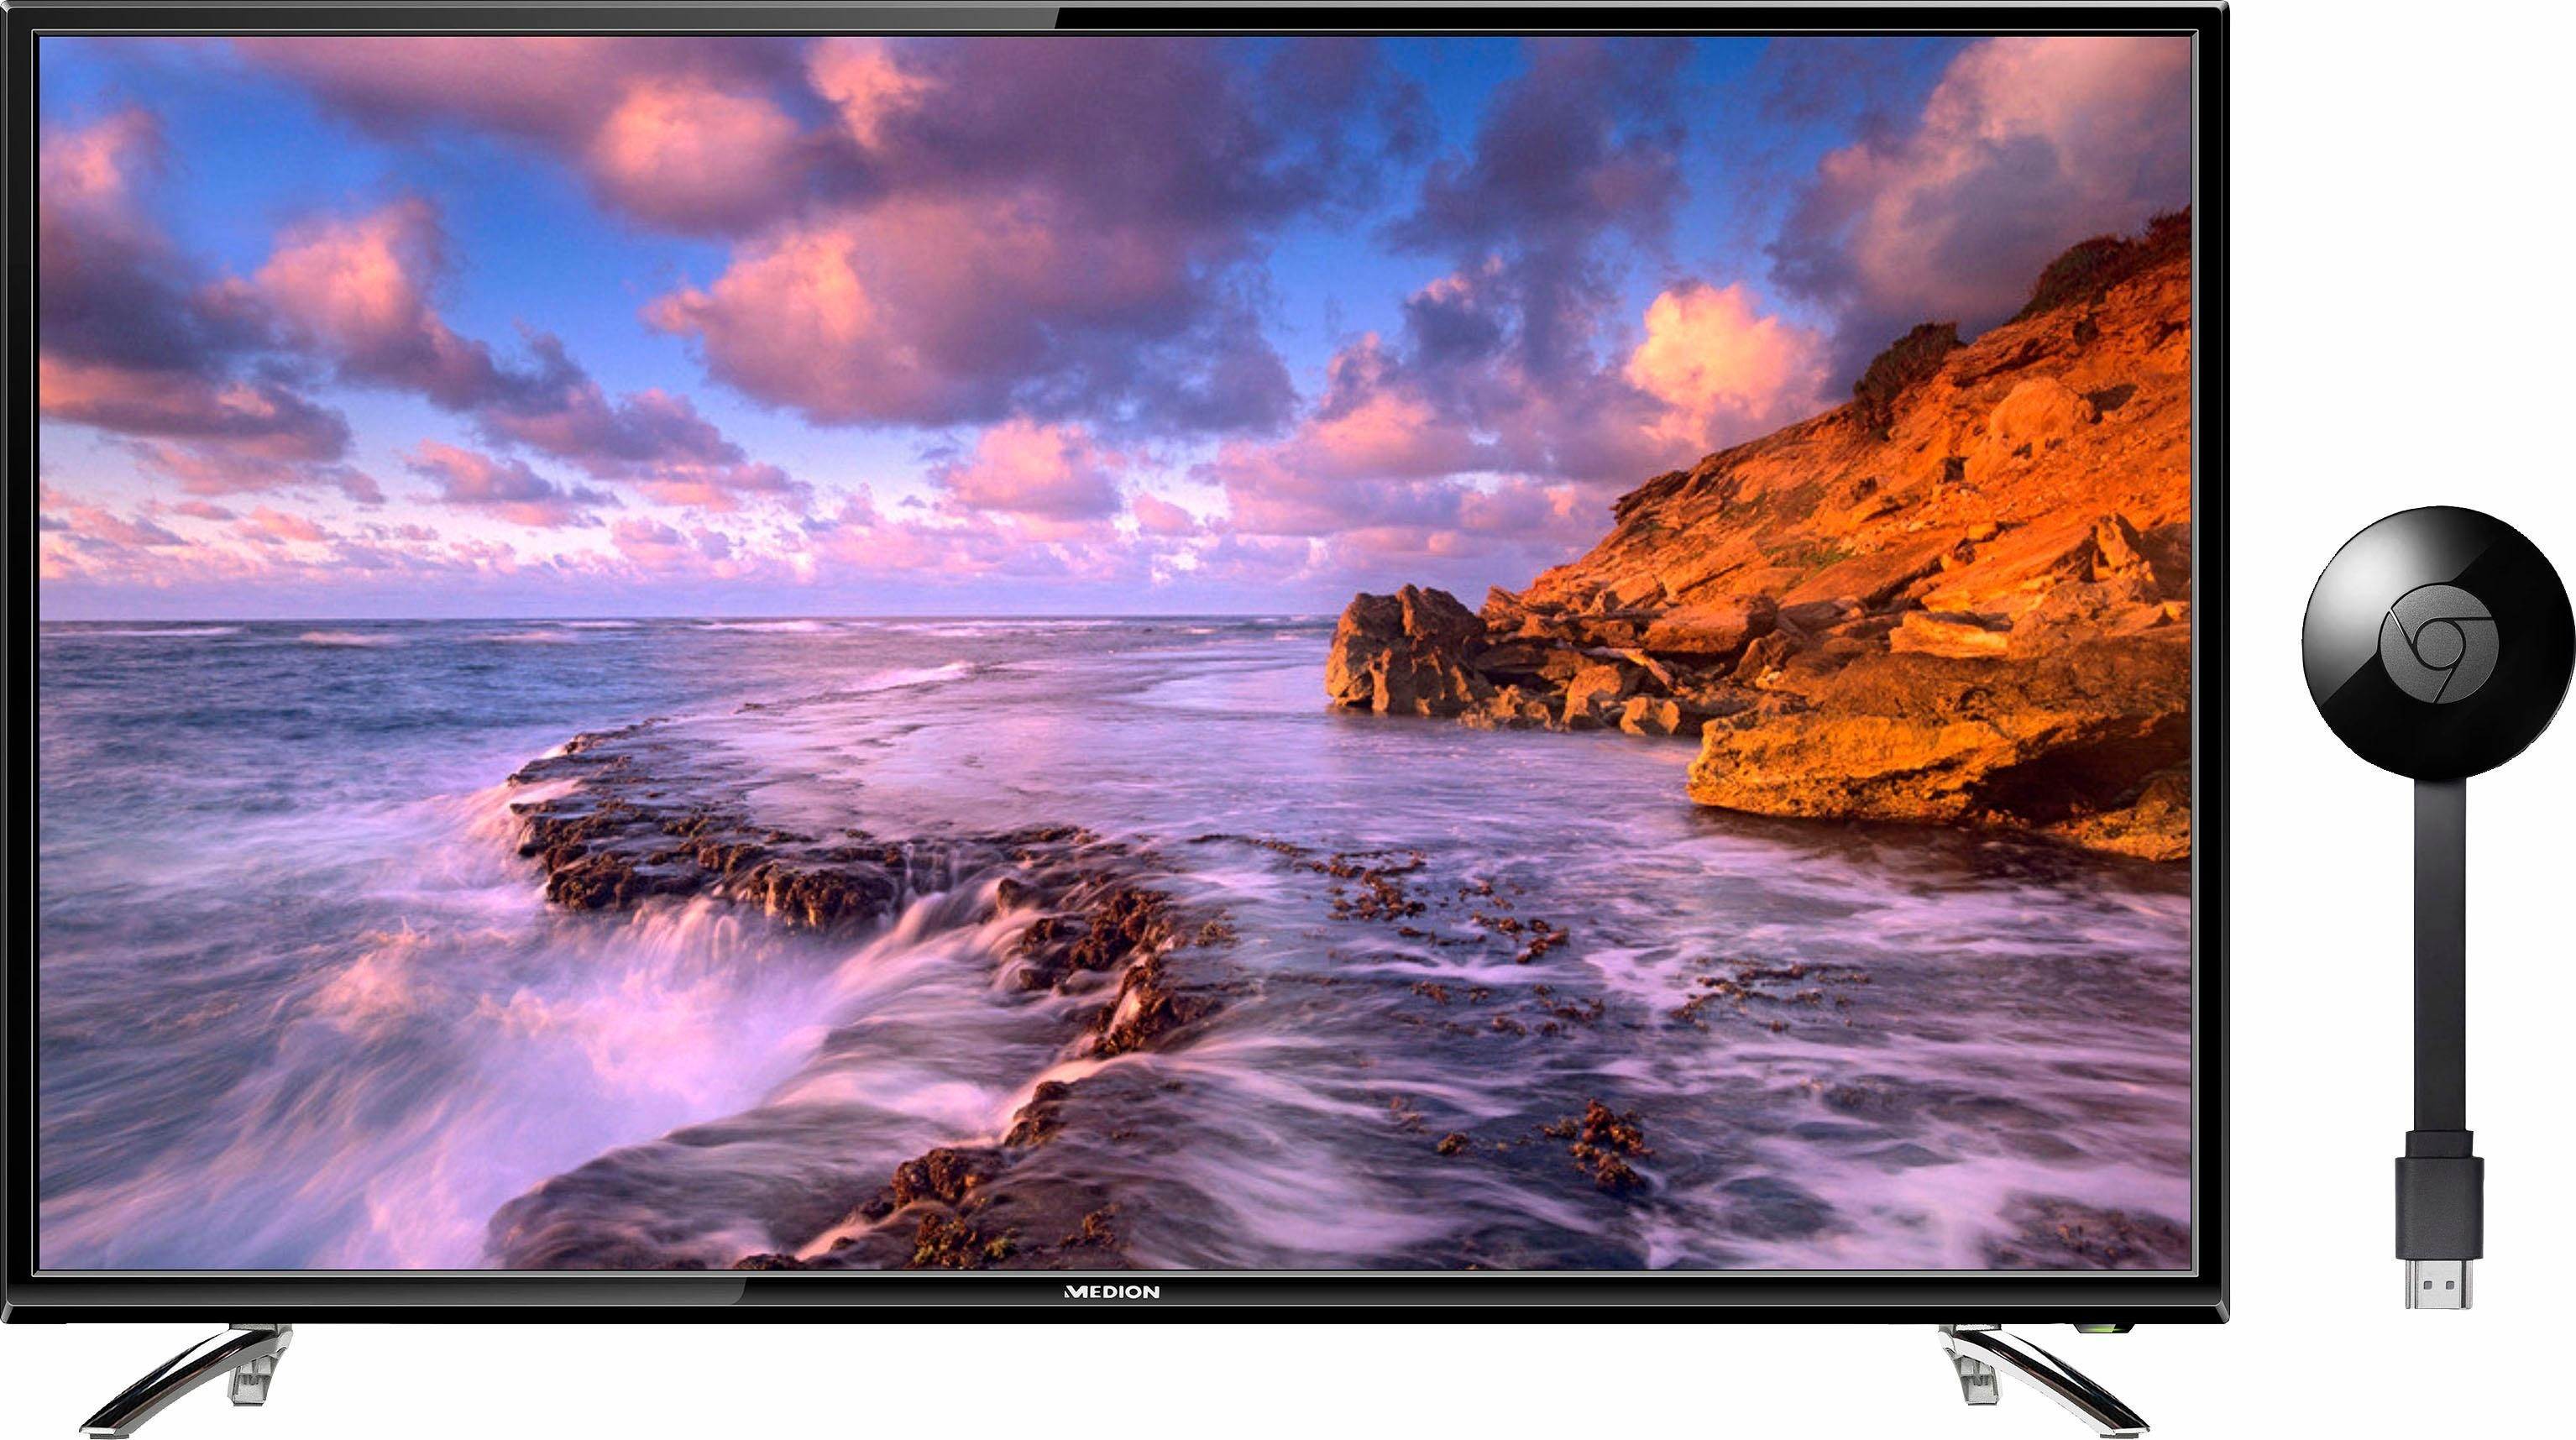 Medion® MD31077 + Google Chromecast, LED Fernseher, 164 cm (65 Zoll), 1080p (Full HD)